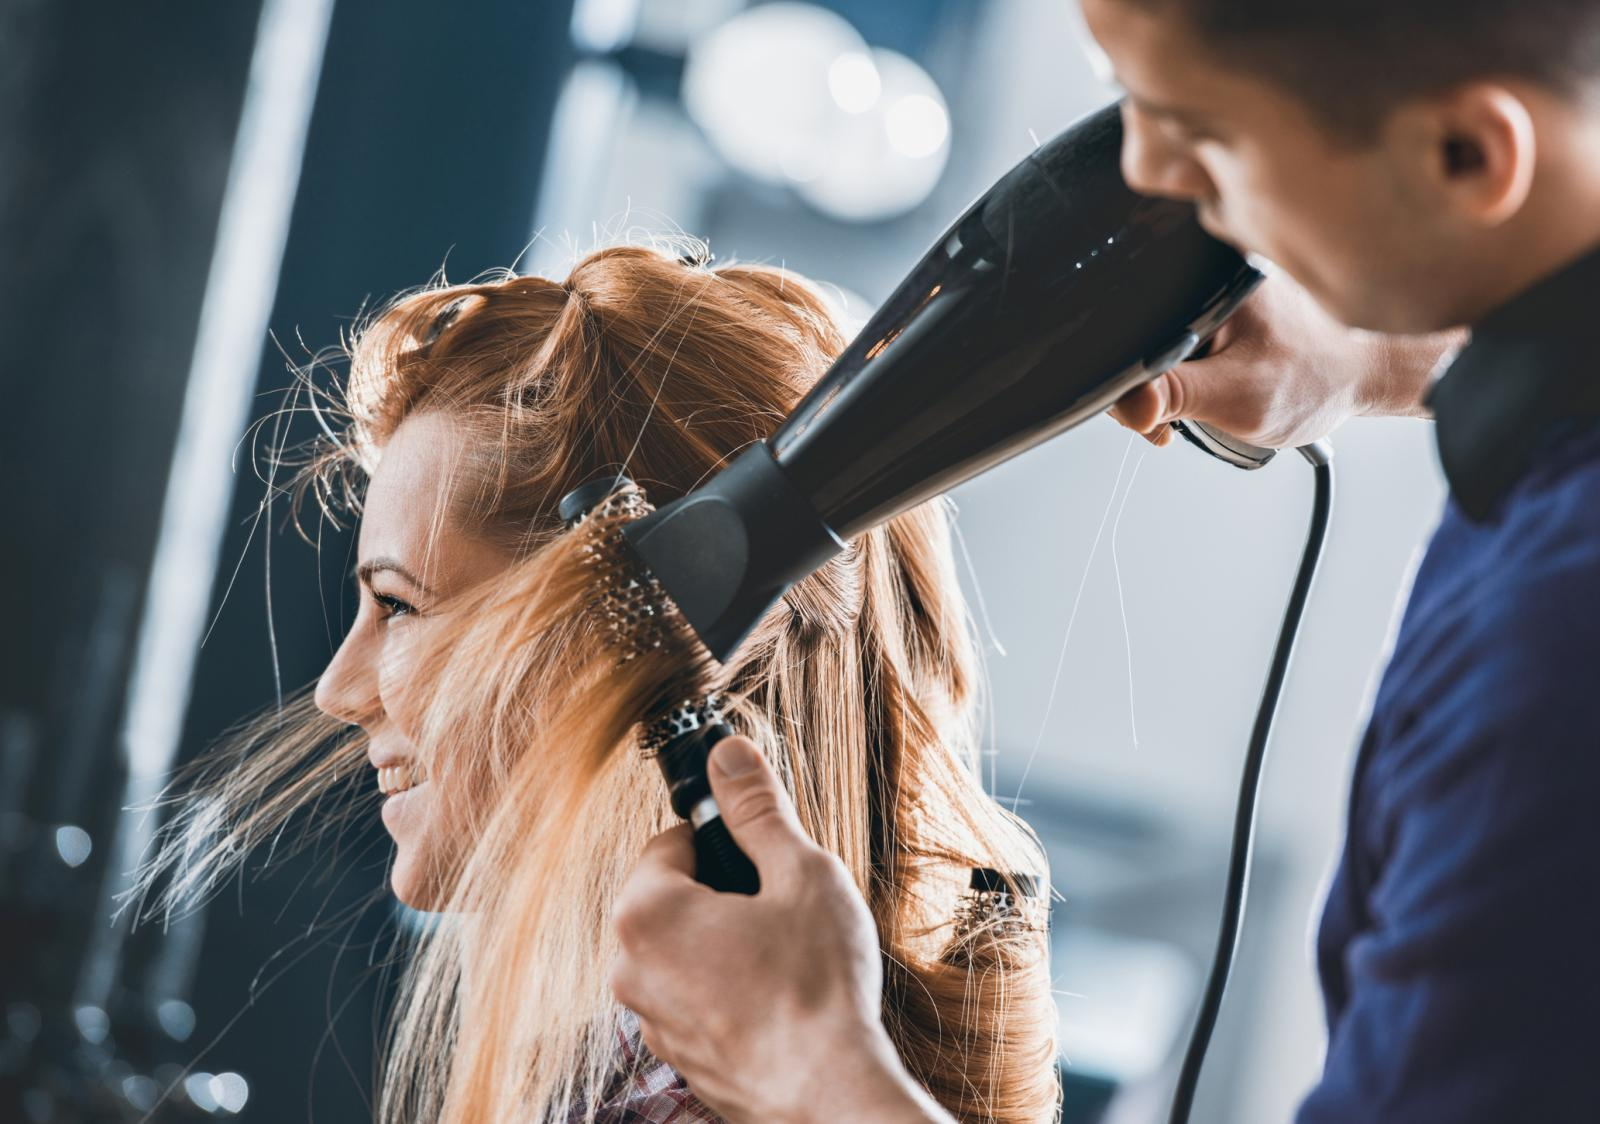 Prilikom sušenja nemojte držati fen preblizu kosi.